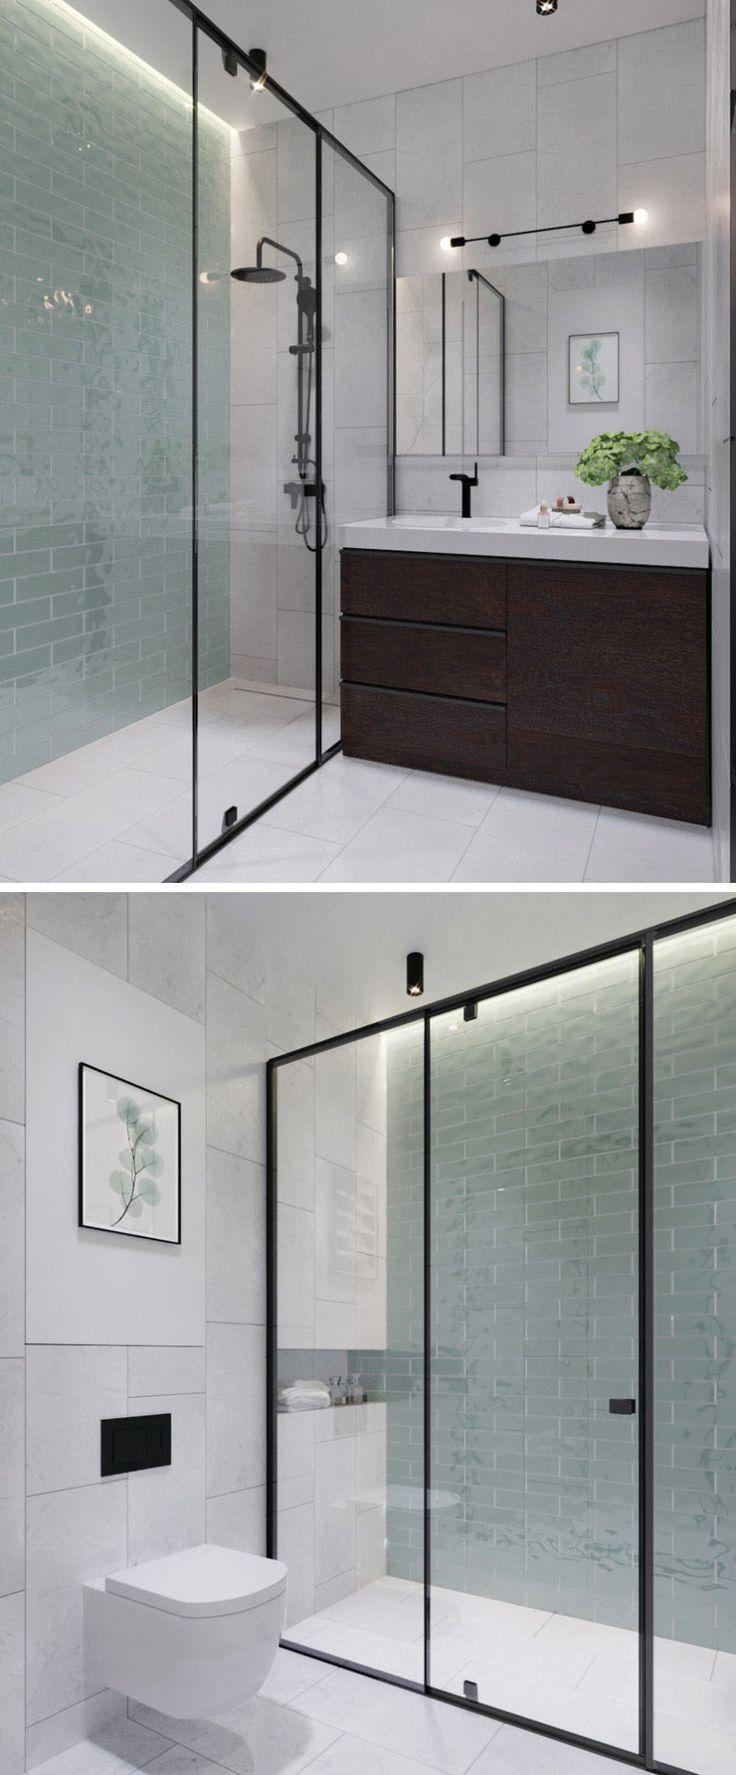 Glass subway tile, cool color (Master bath)